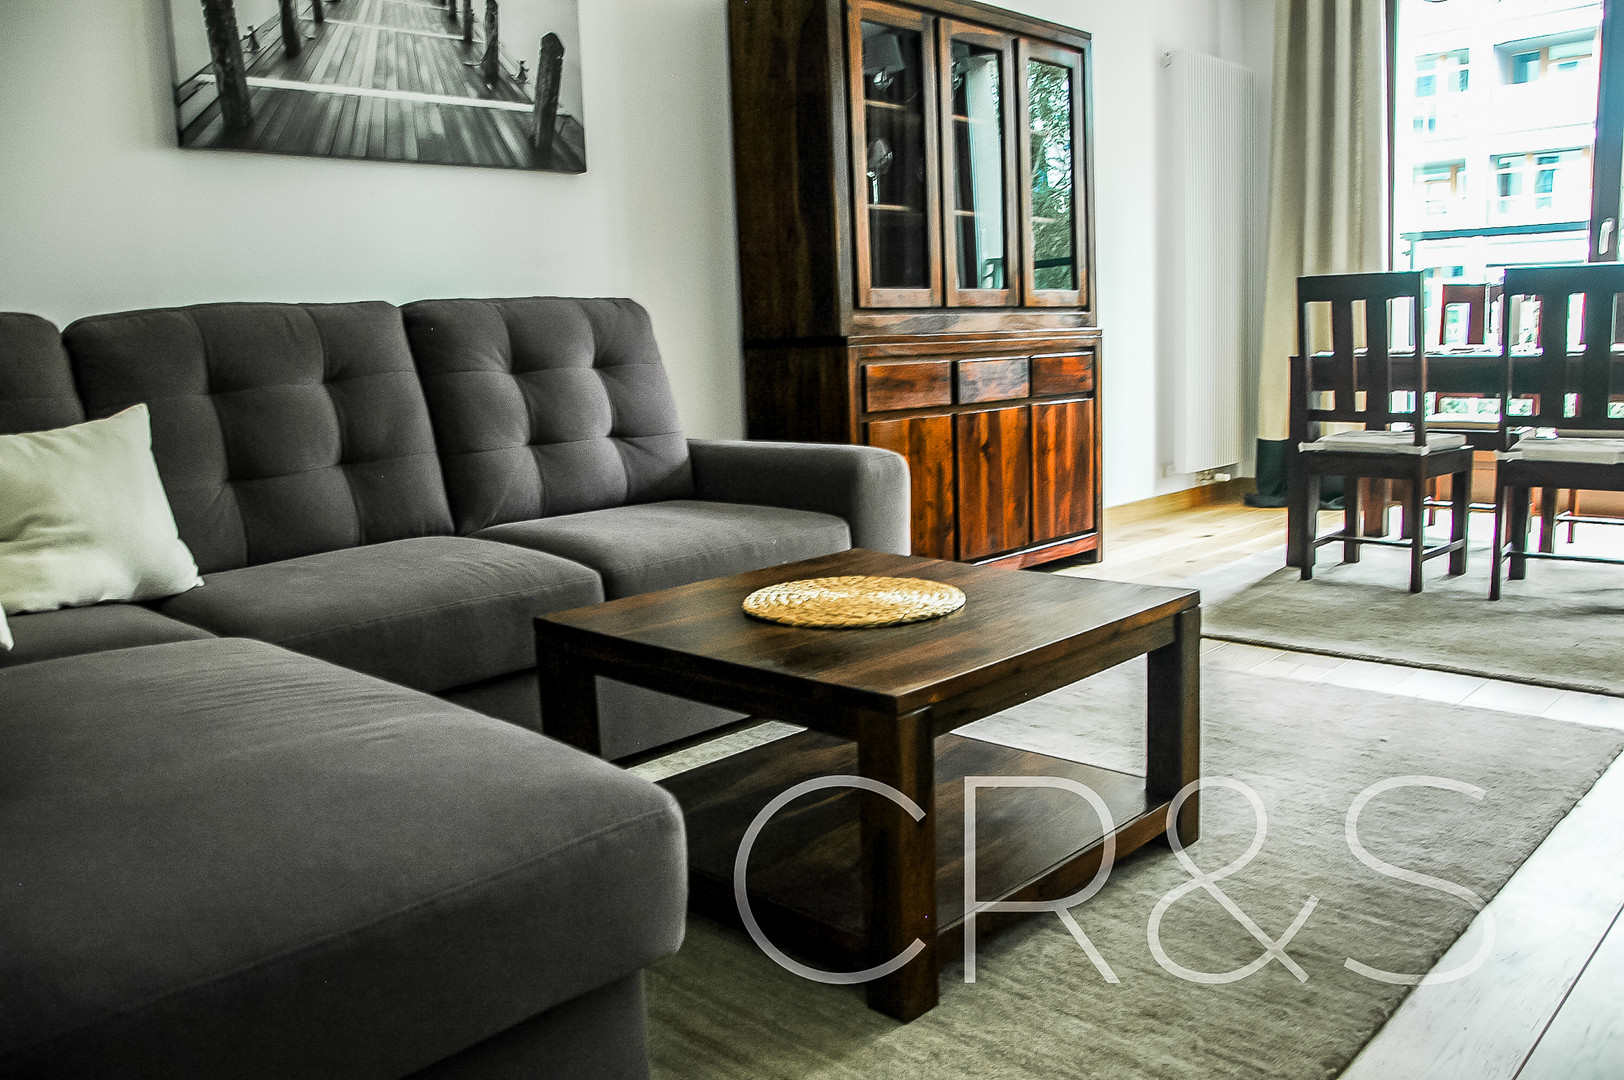 Apartments for rent Kolejowa Warsaw_0846